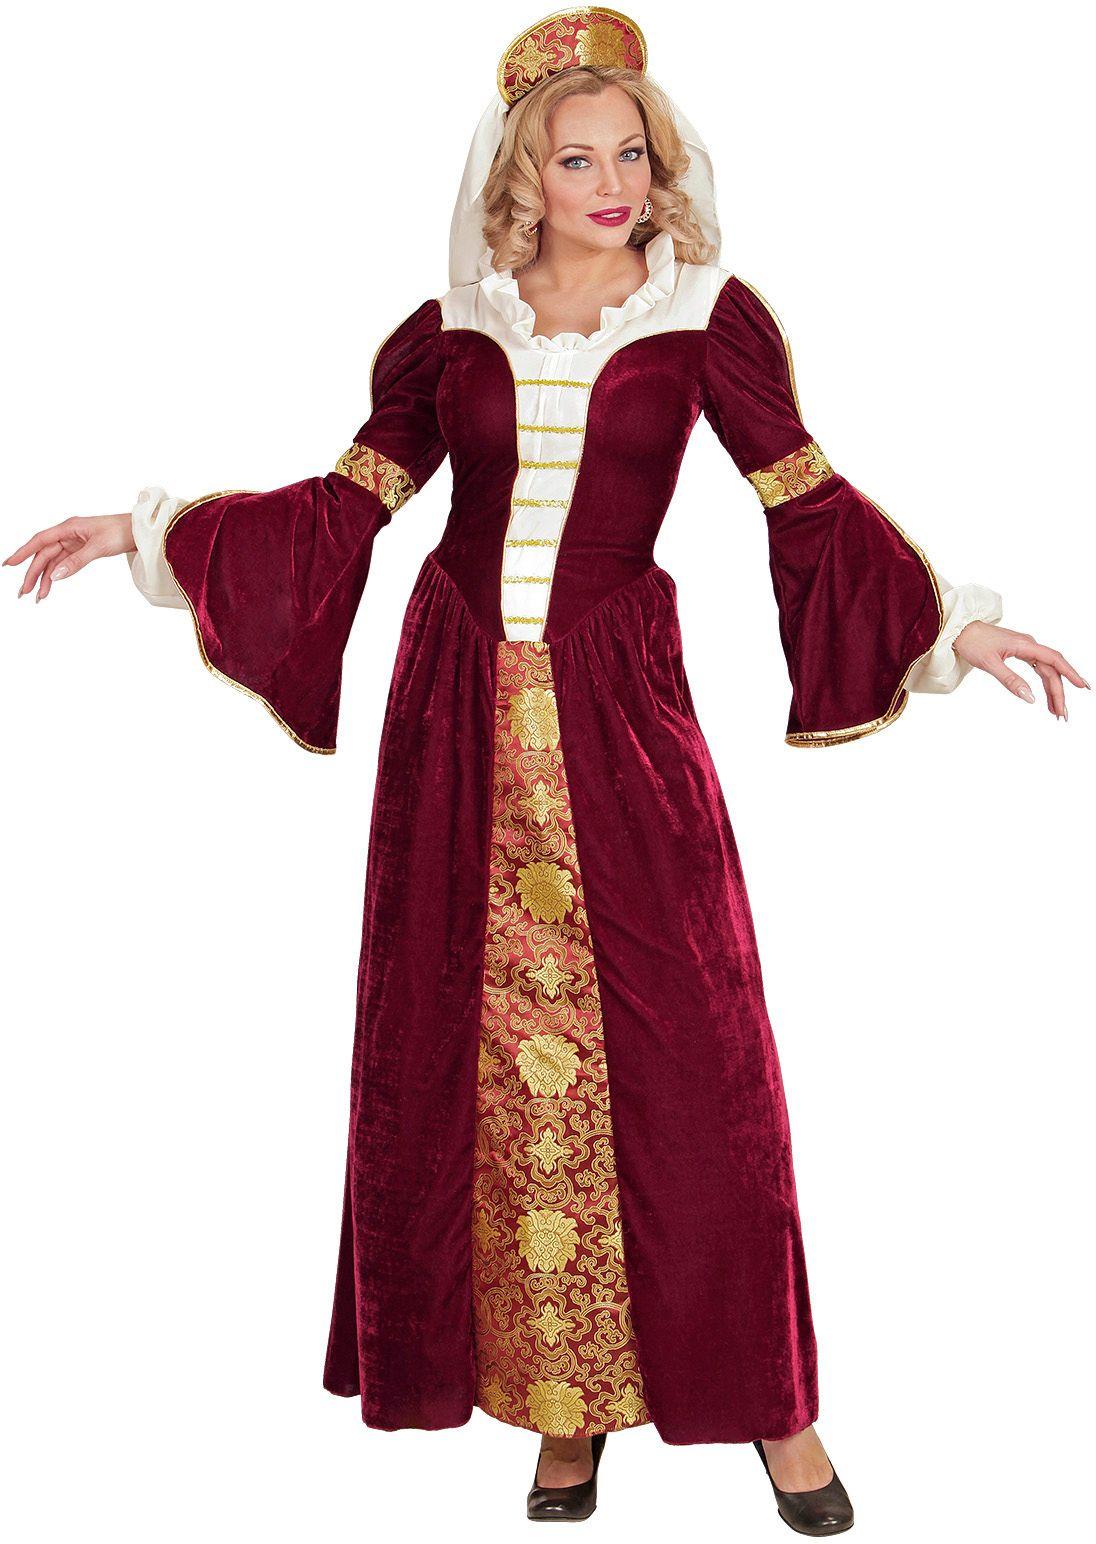 Middeleeuwse koningin kleding